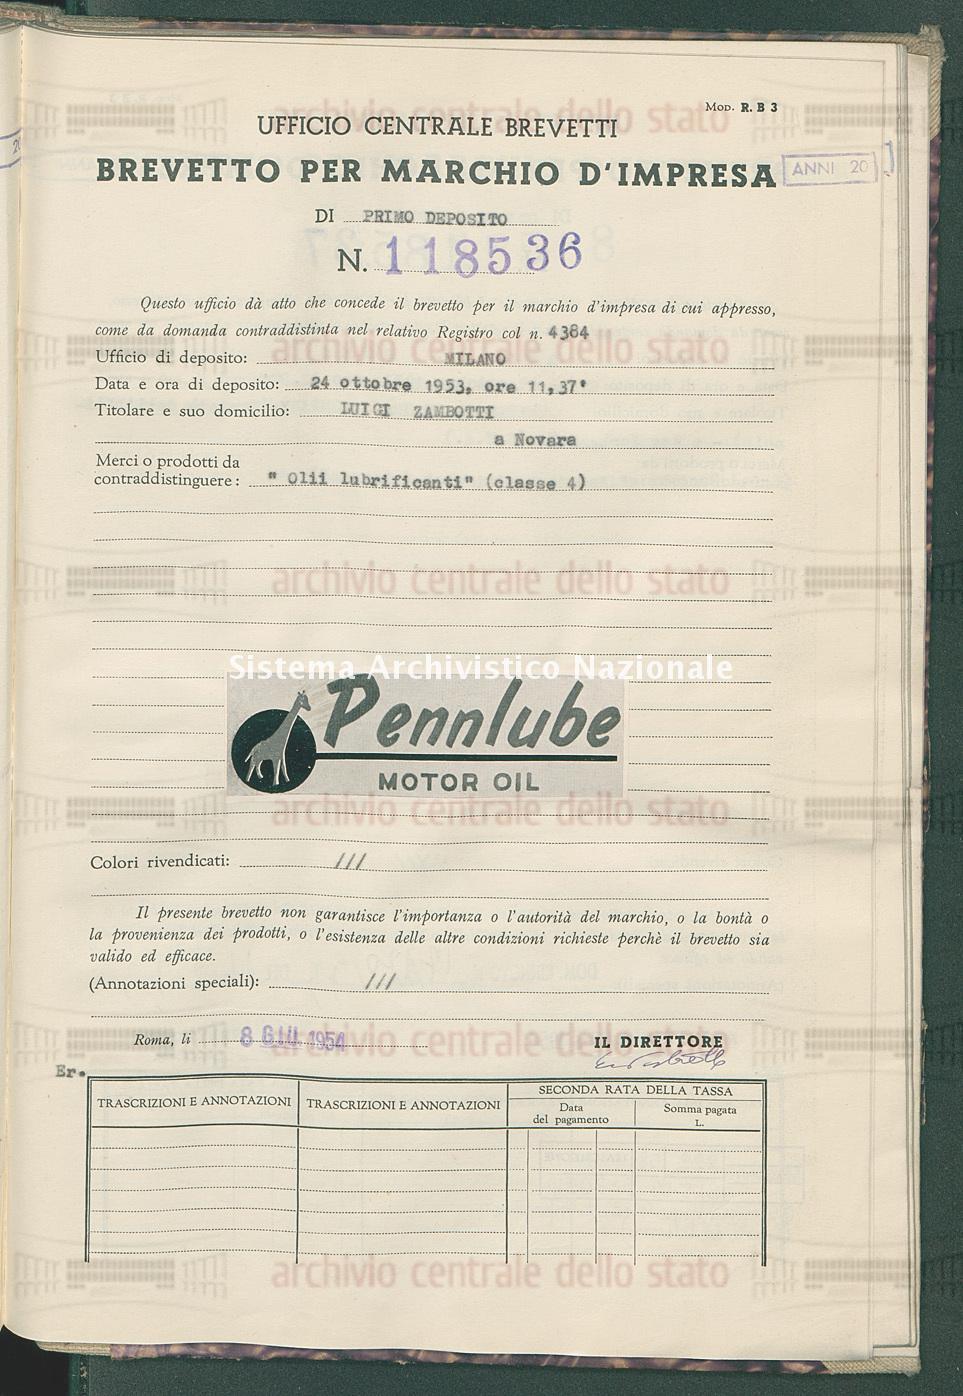 'Olii lubrificanti' Luigi Zambotti (08/06/1954)